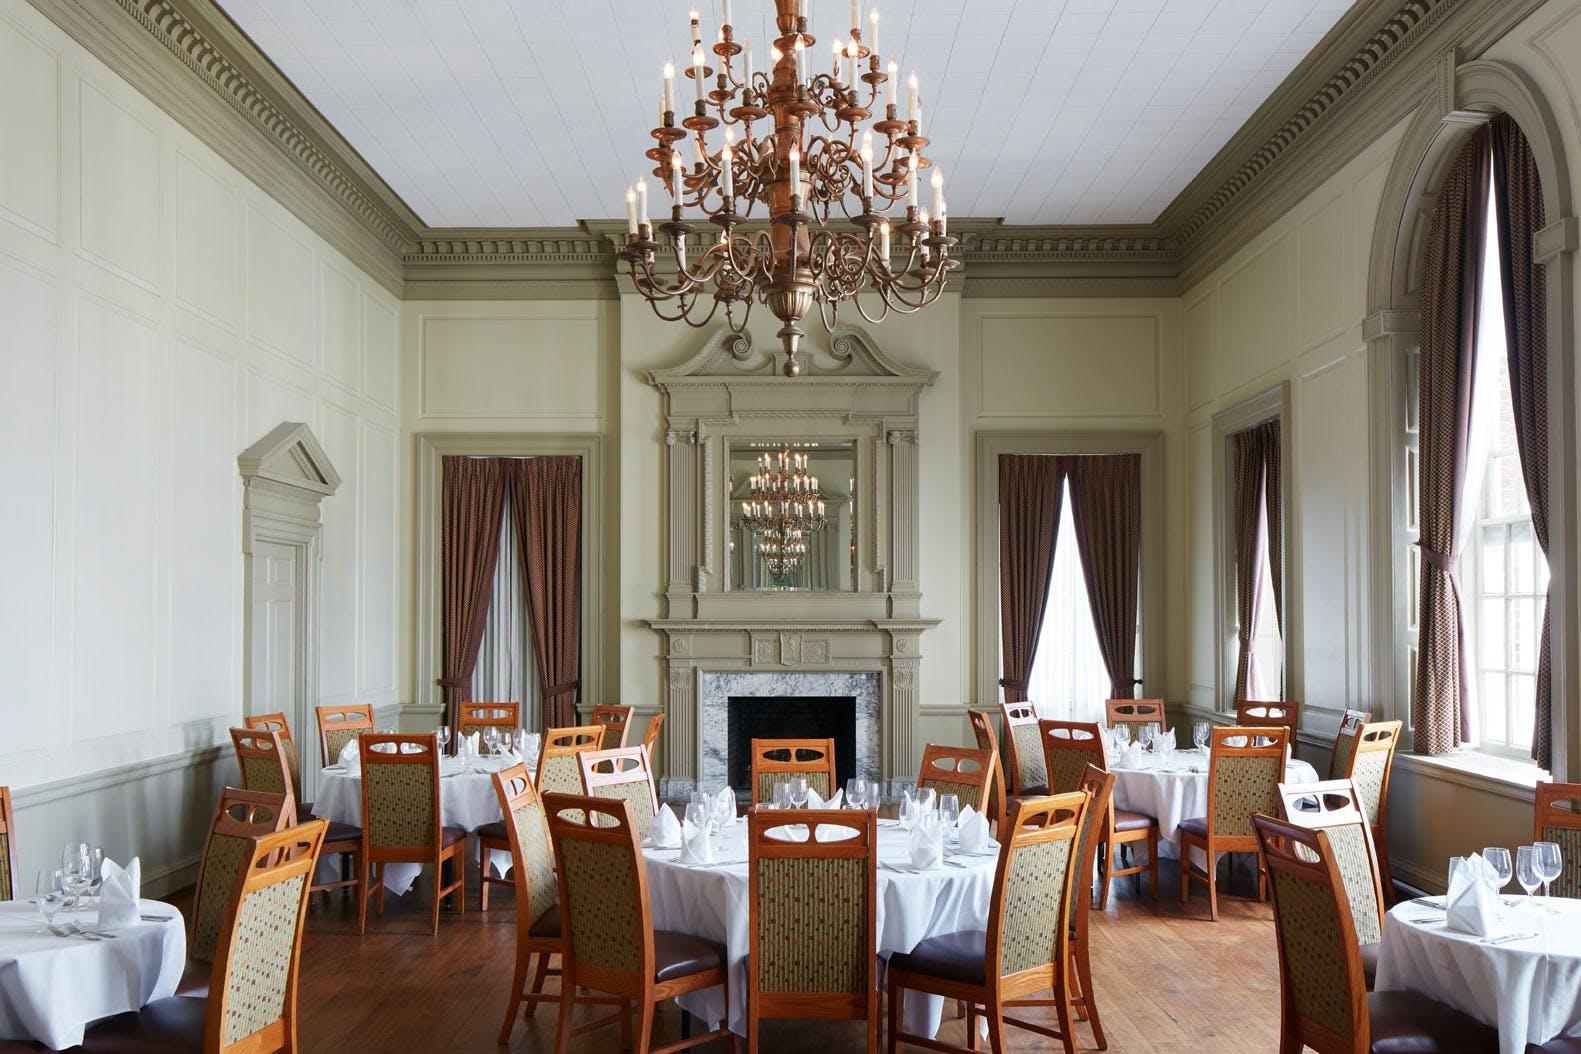 Meetings & Events Room at Club Quarters Hotel in Philadelphia